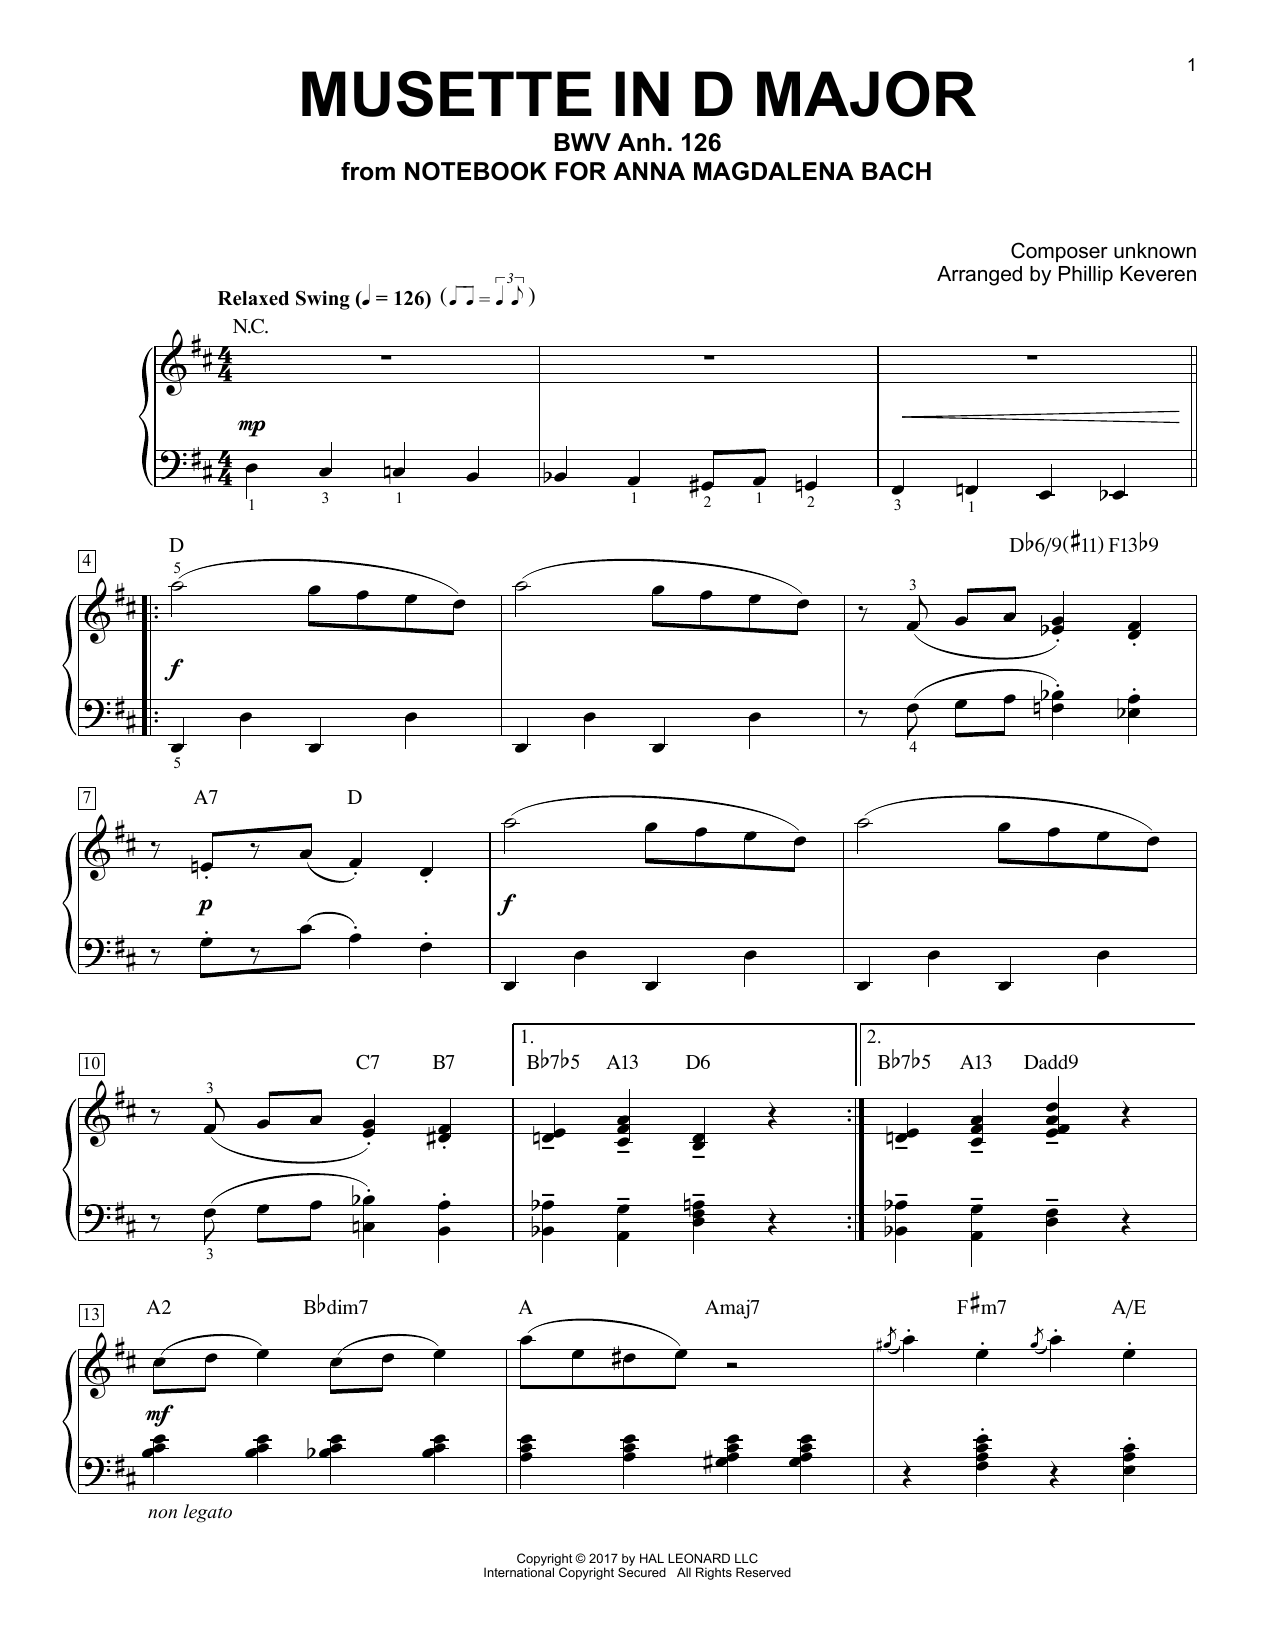 Johann Sebastian Bach Musette In D Major, BWV Anh. 126 [Jazz version] (arr. Phillip Keveren) sheet music notes and chords. Download Printable PDF.